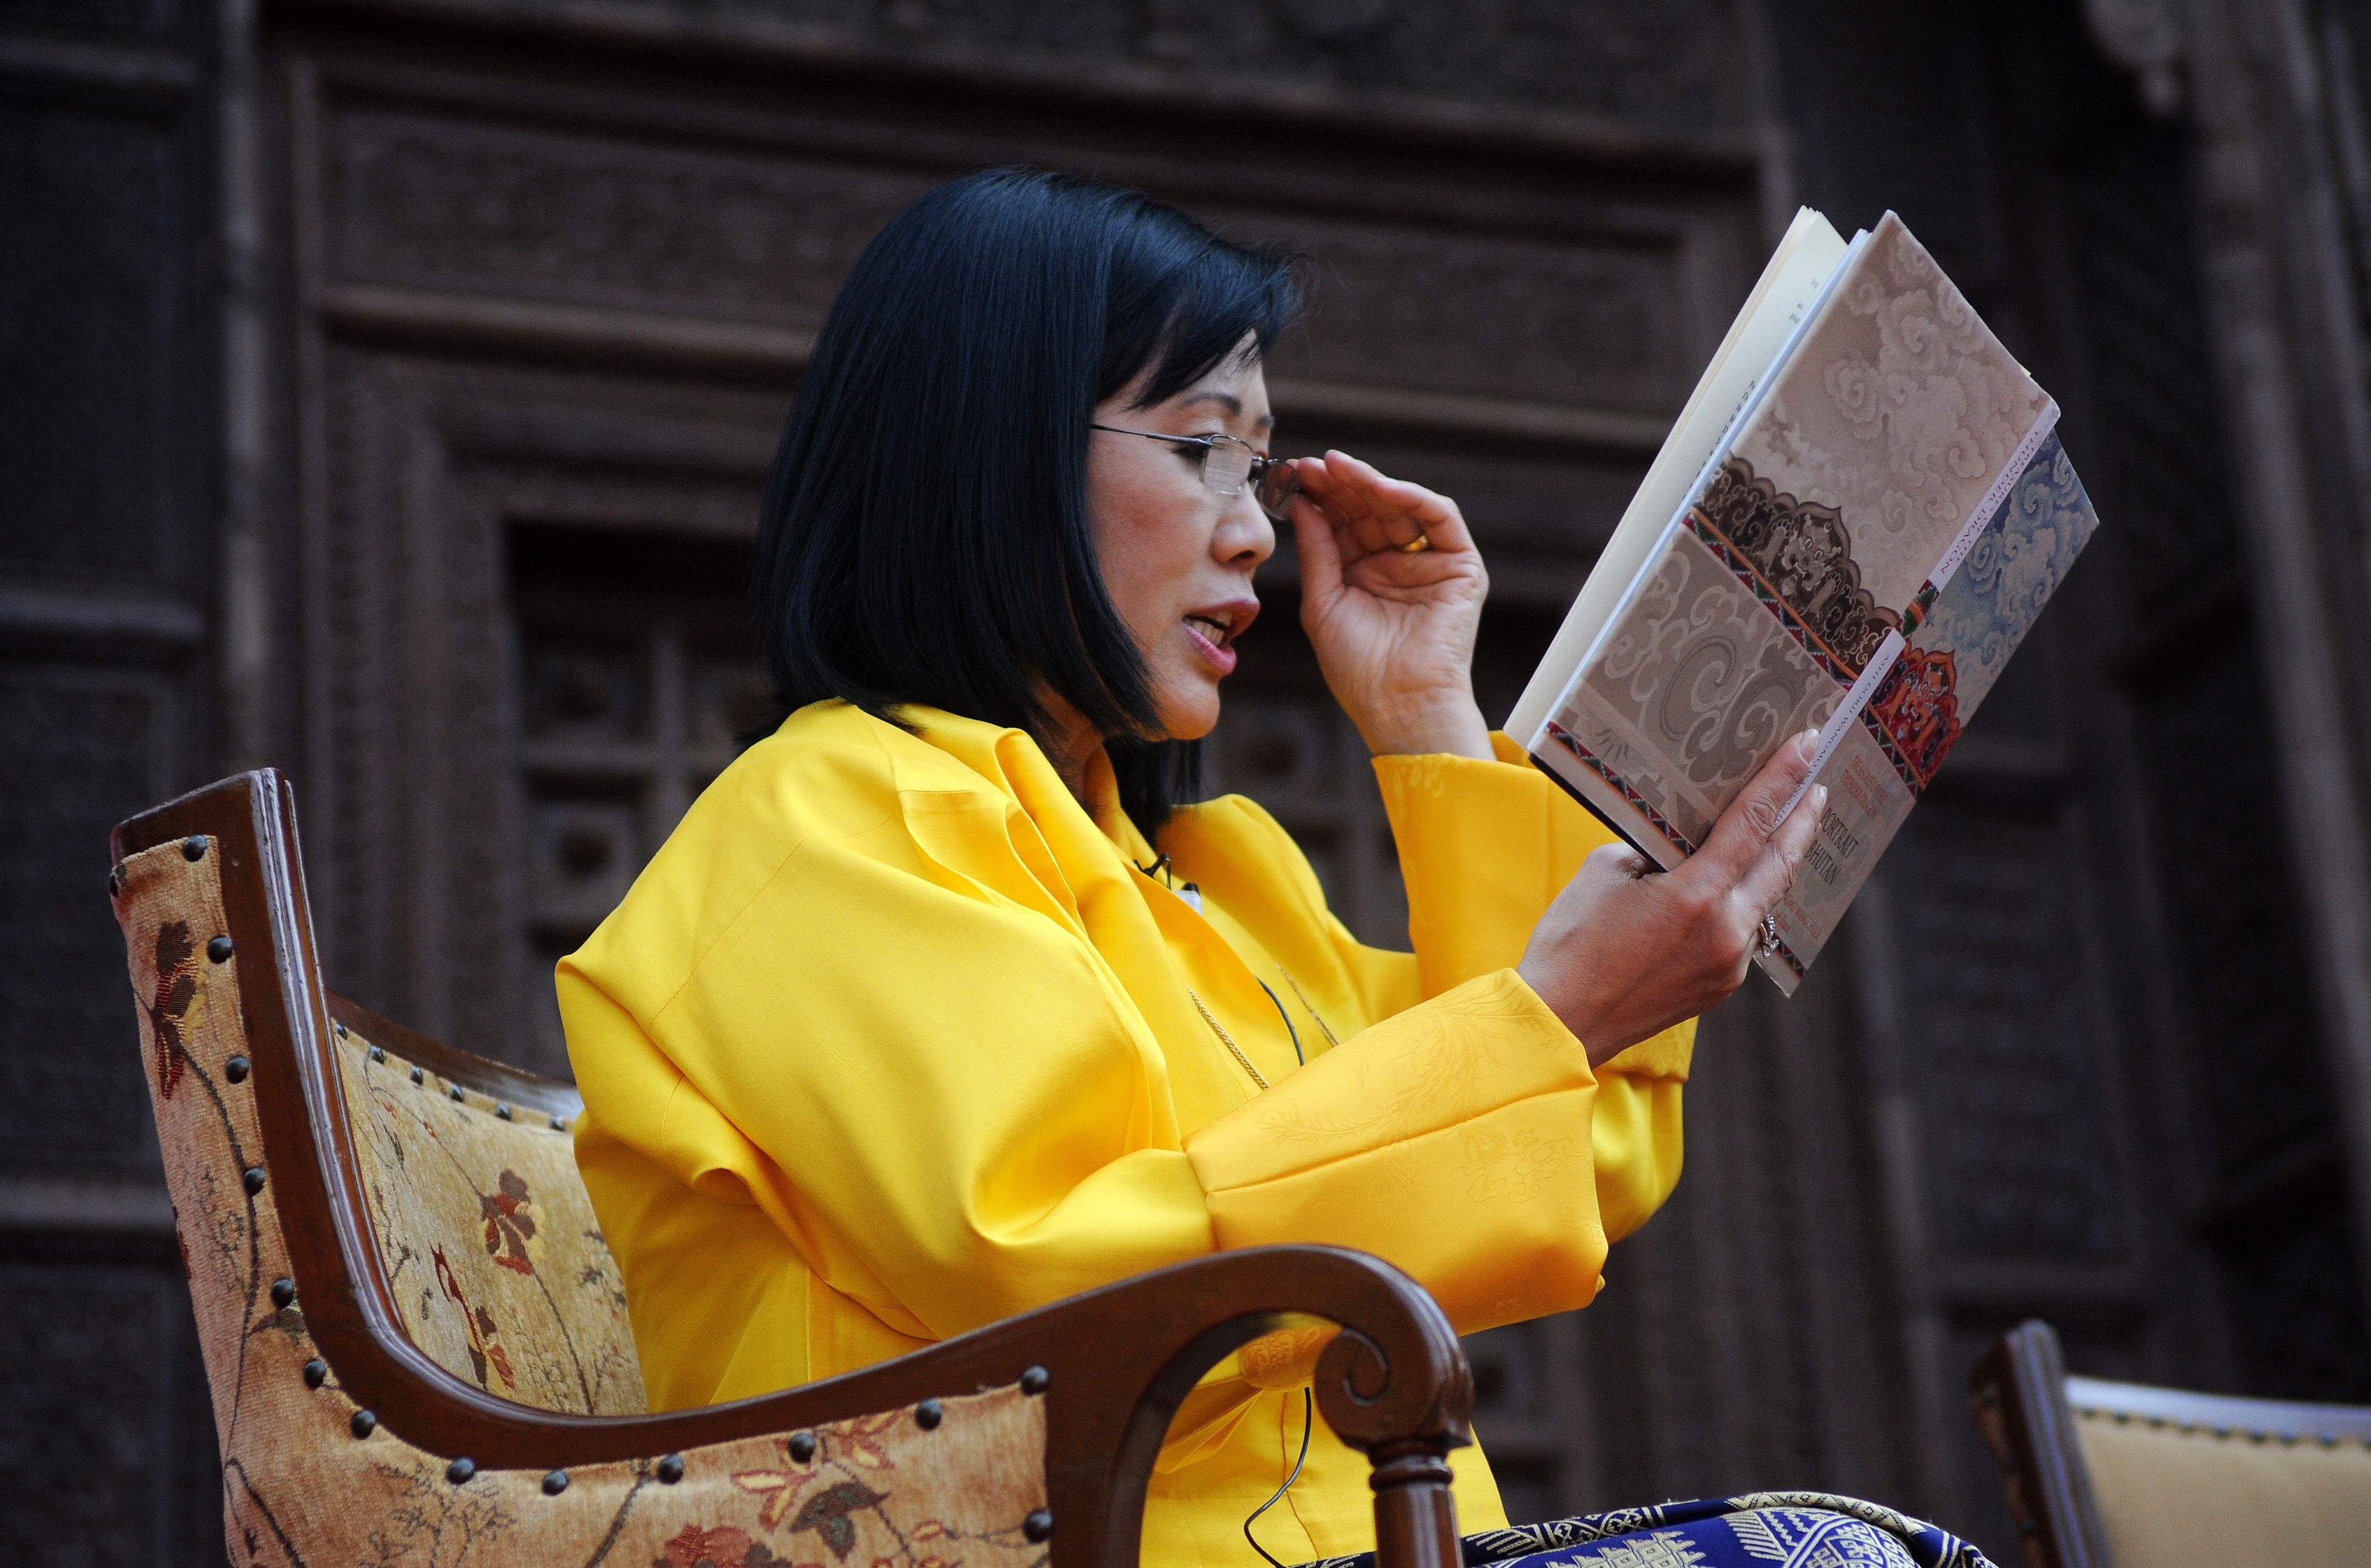 Die Königinmutter von Bhutan: Ashi Dorji Wangmo Wangchuck, (64)